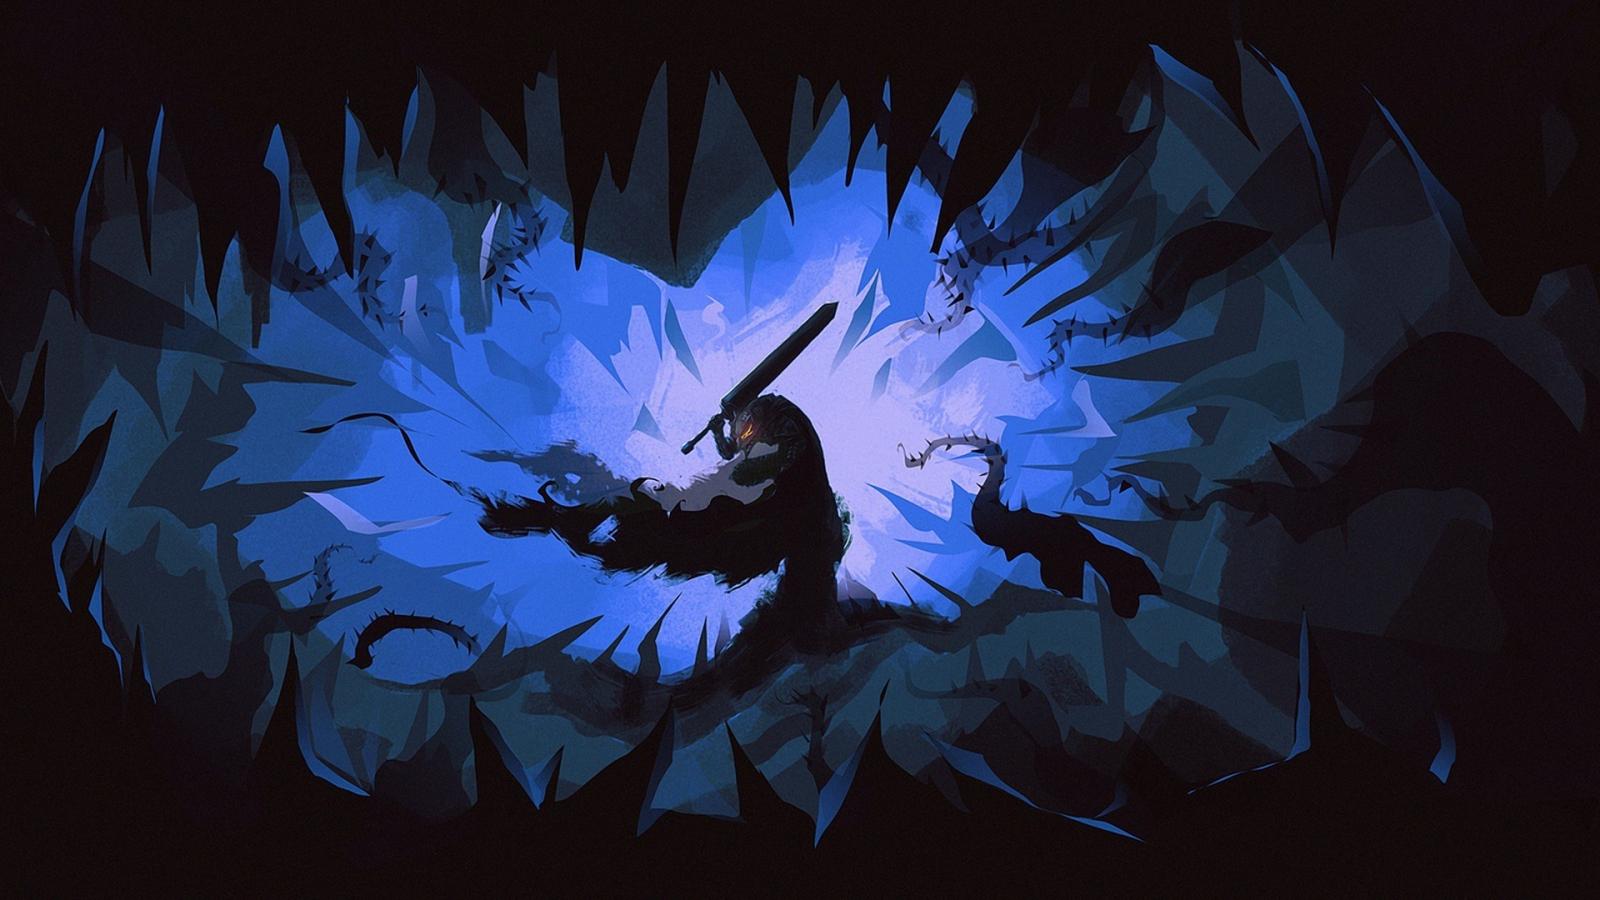 Download 1600x900 Wallpaper Berserk Manga Anime Dark